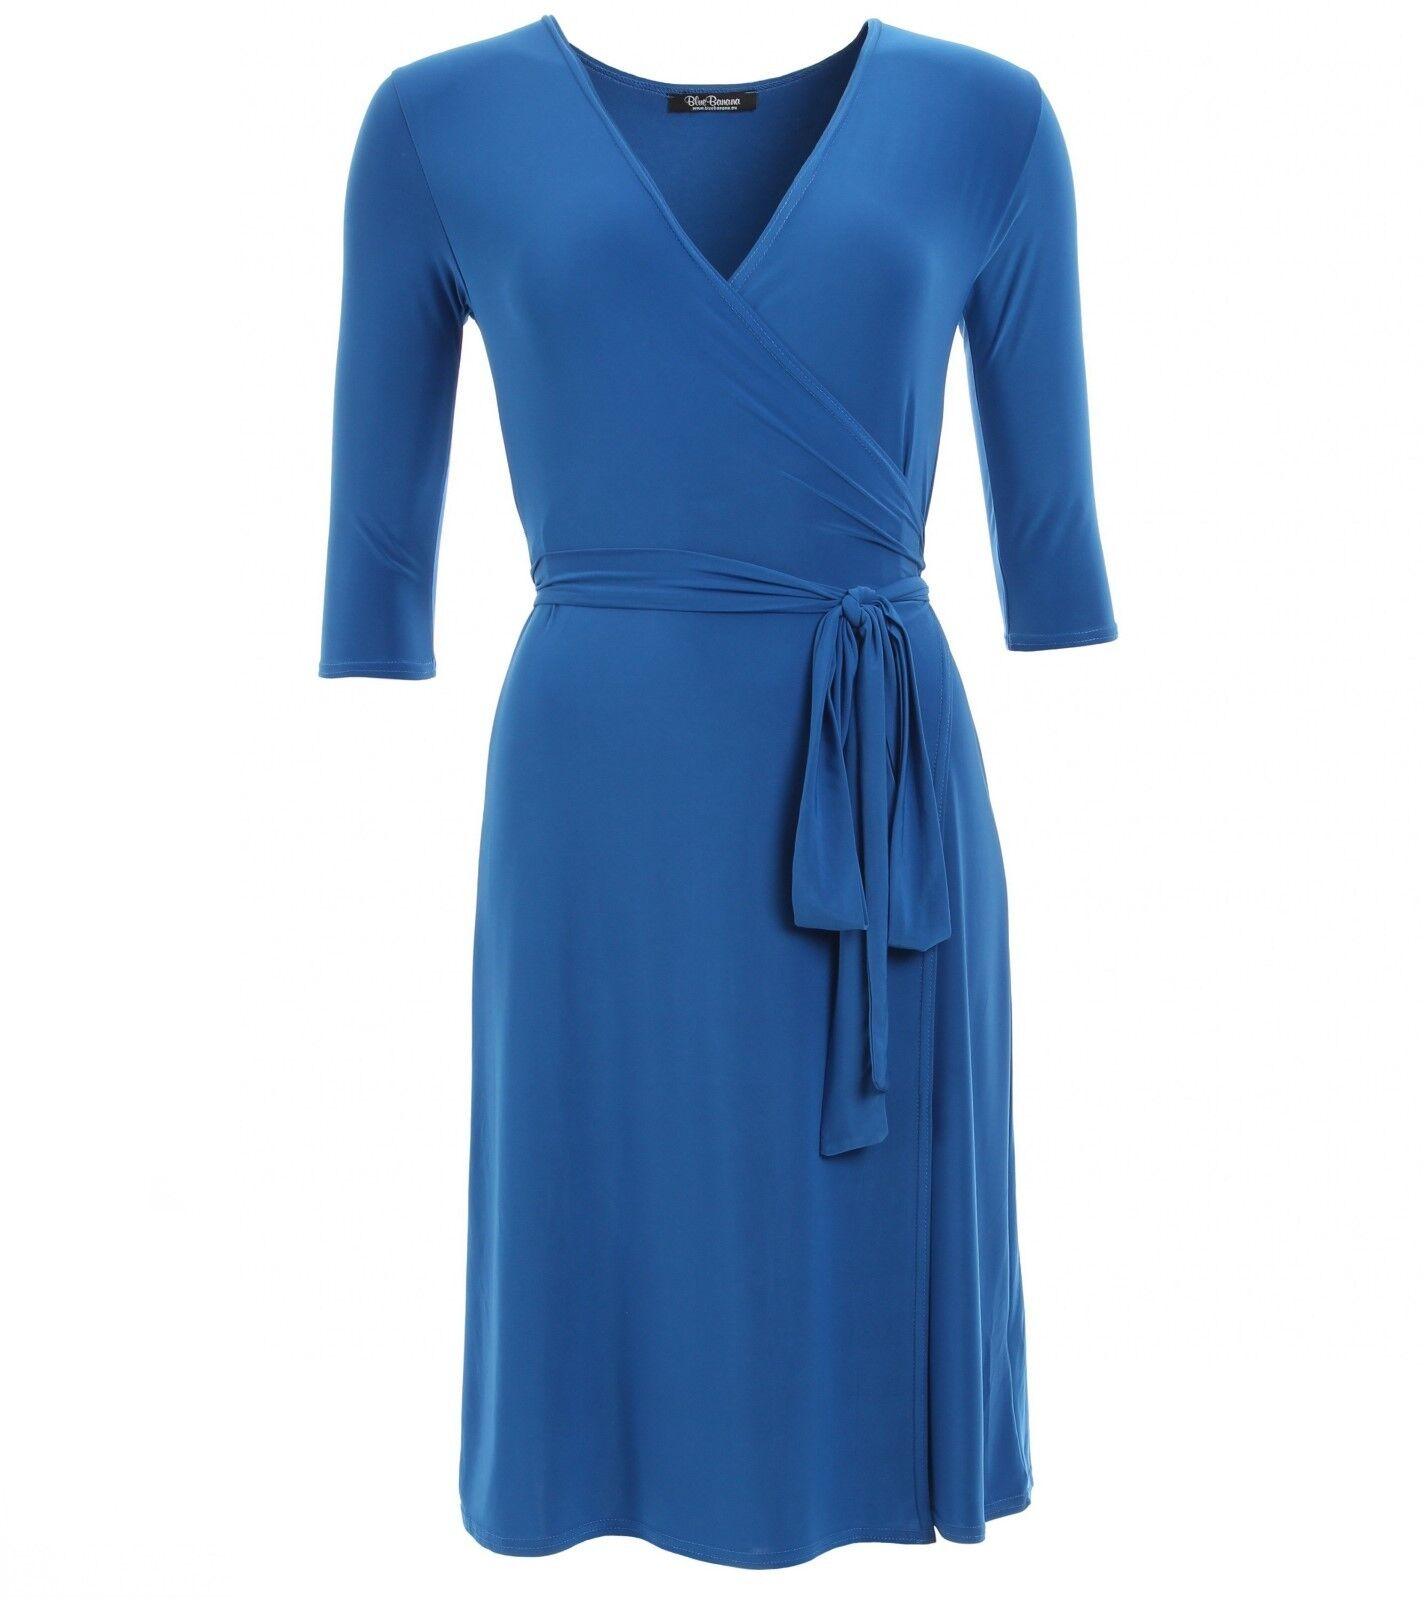 New Elegant Slinky V Neck Wrap Dress 3//4 Length Sleeve